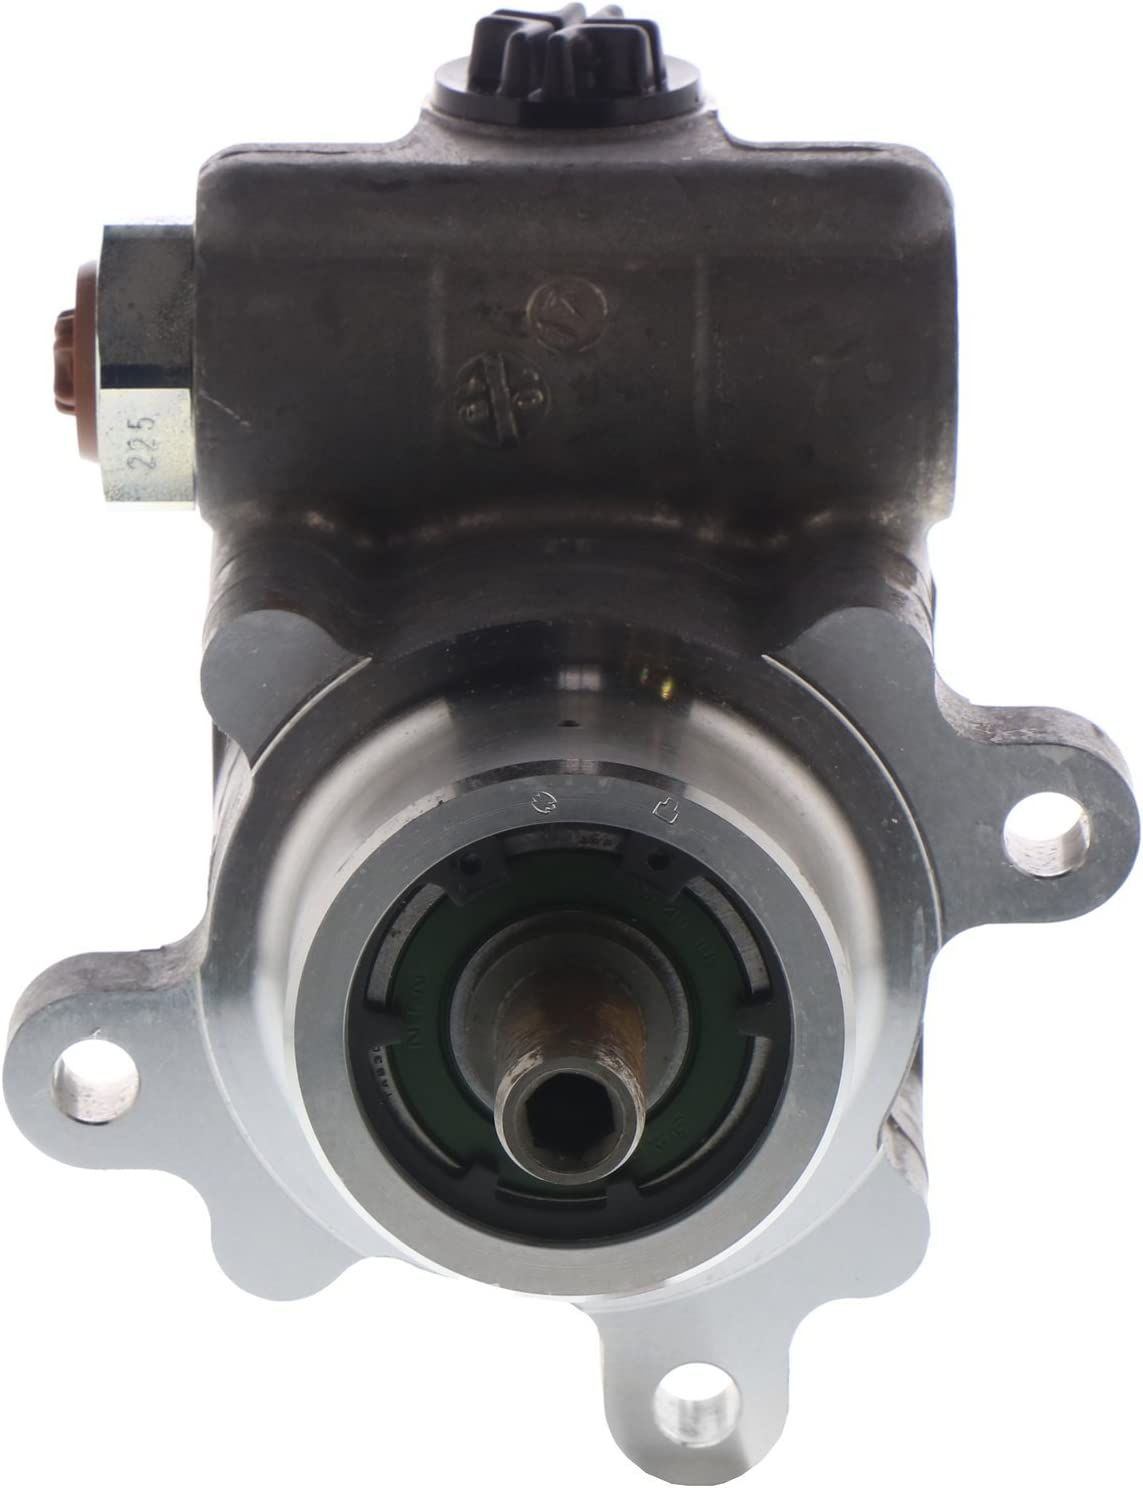 Bosch KS00001481 New 40% OFF Cheap Sale Power Outstanding Steering Chevrolet C4500 Kod Pump for